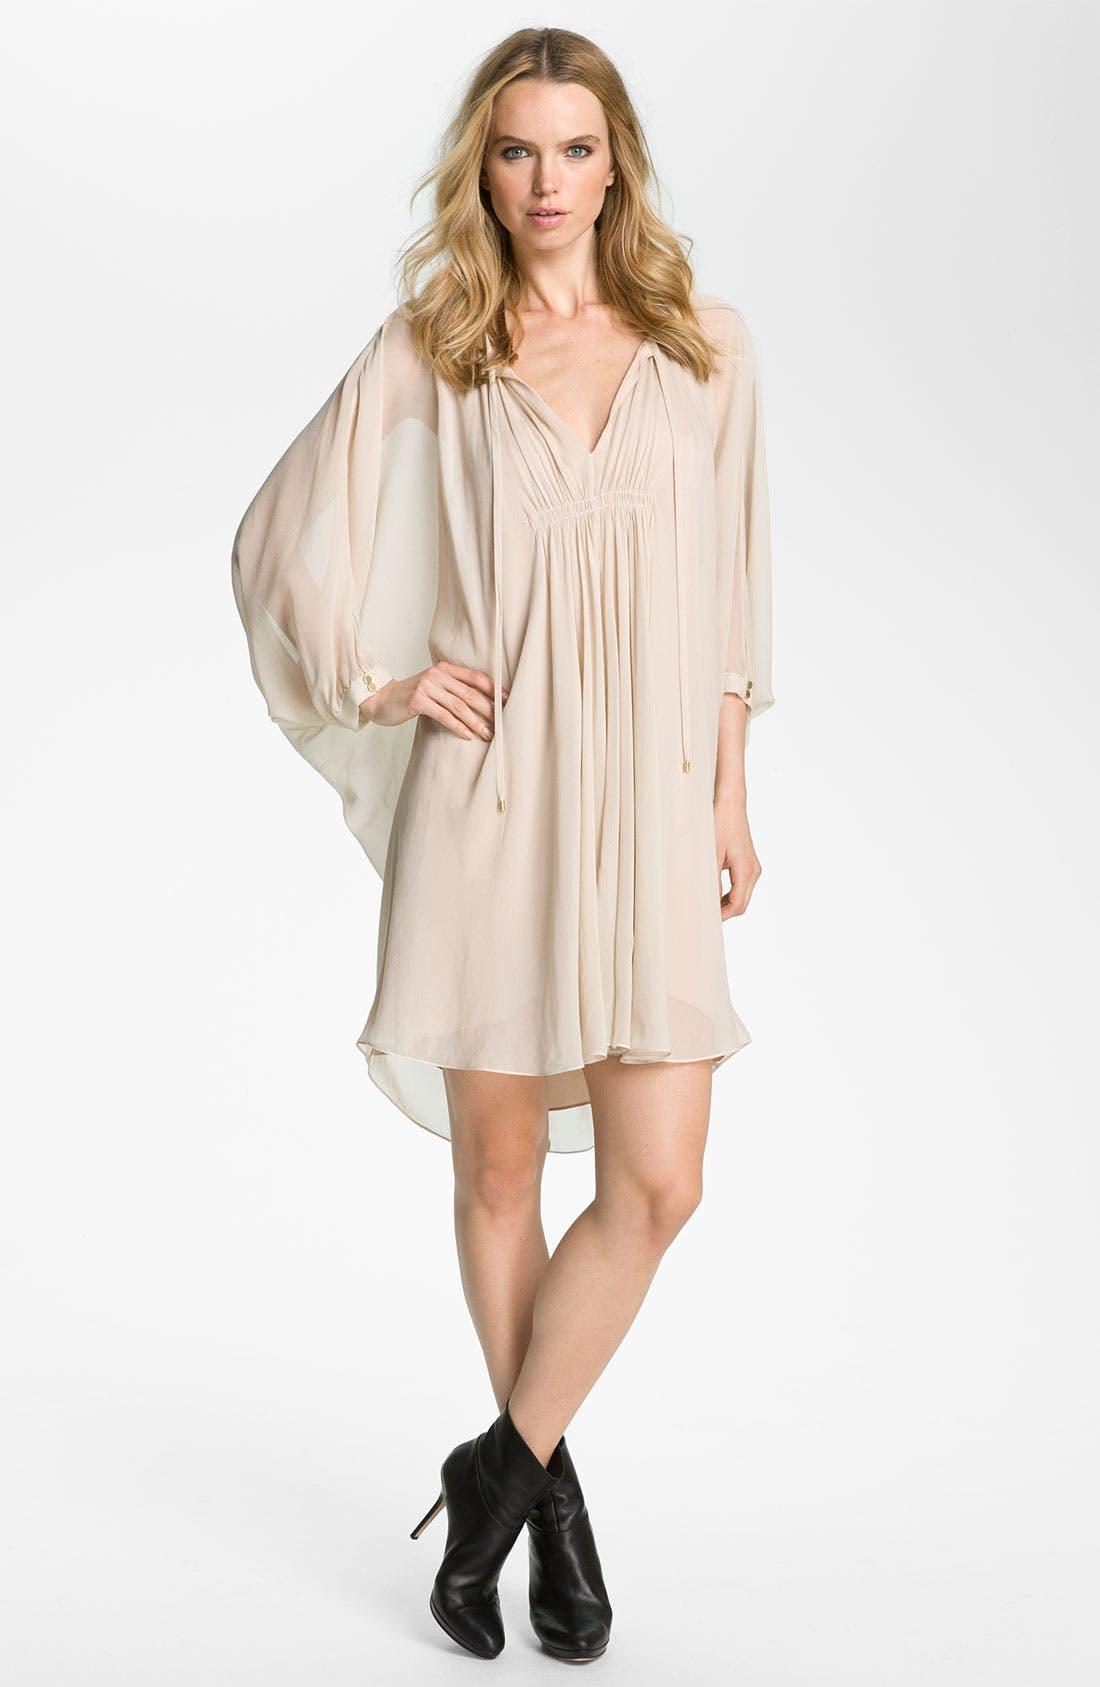 Alternate Image 1 Selected - Diane von Furstenberg 'New Fleurette' Dress